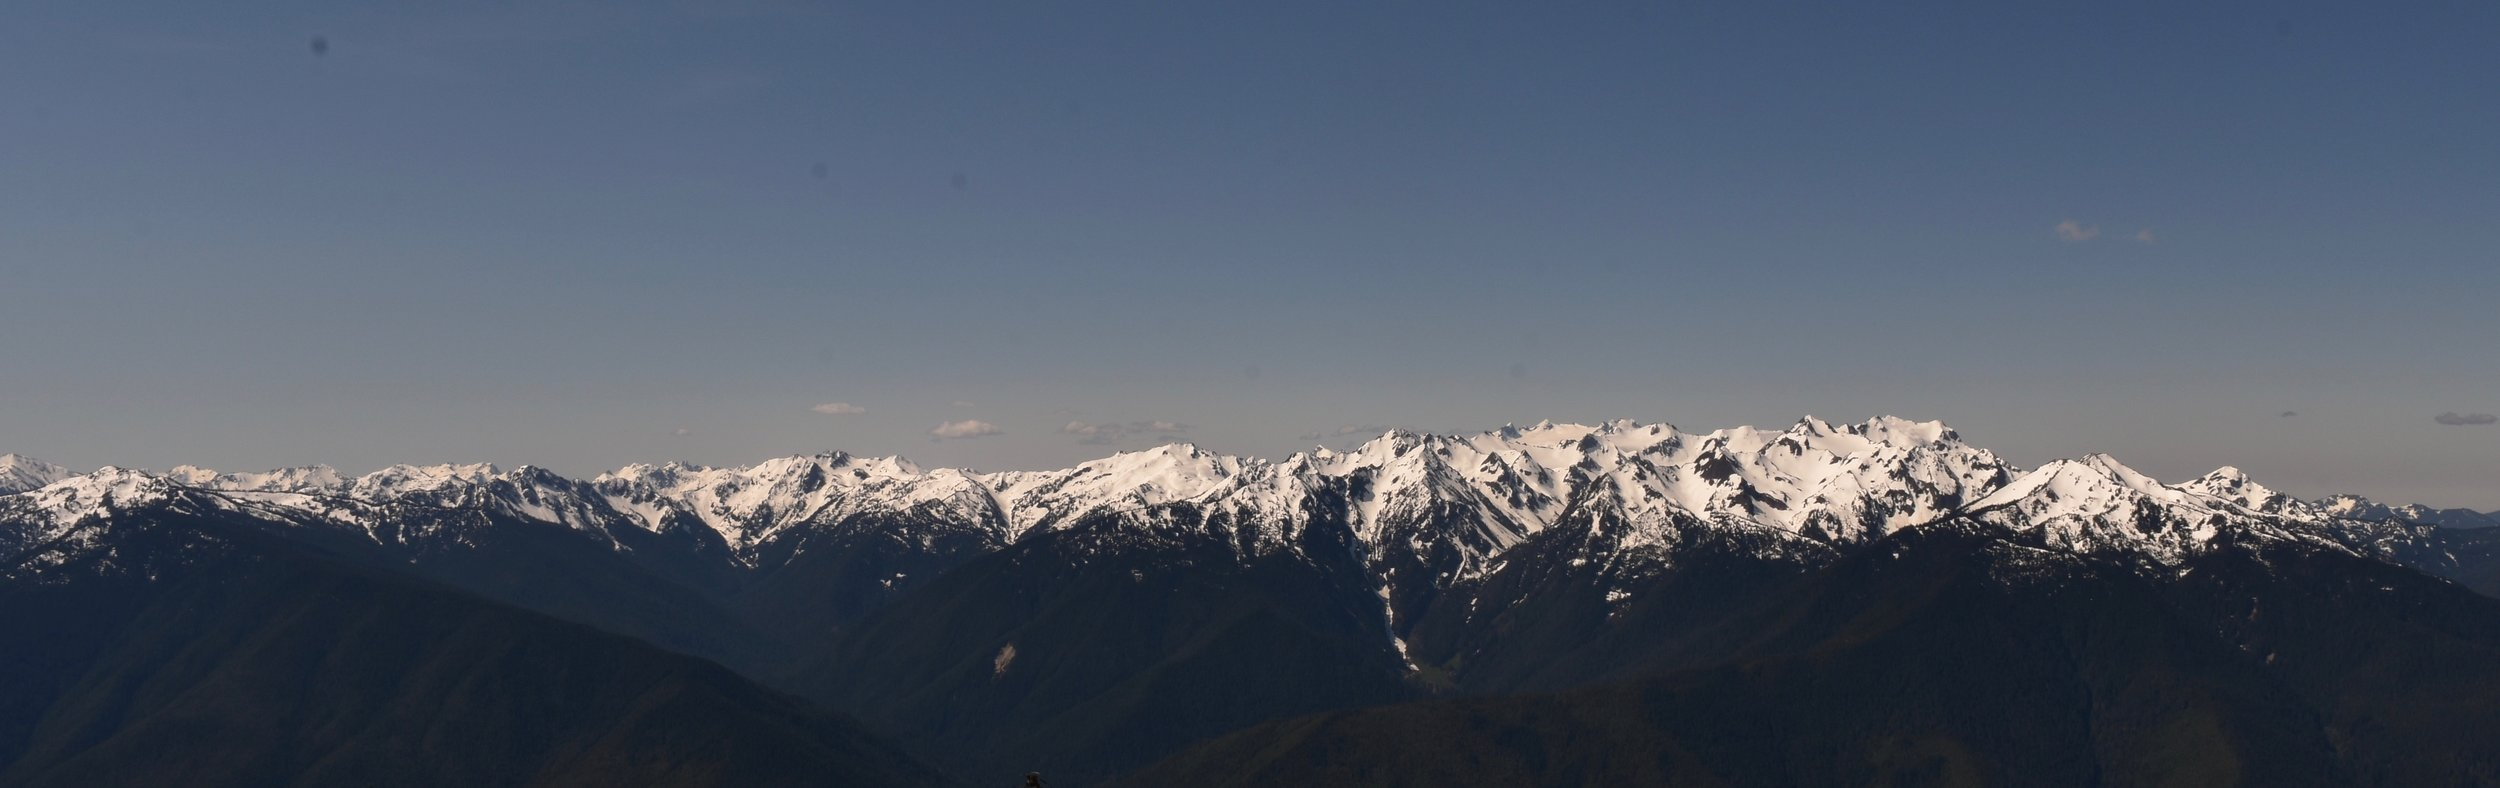 American Alps